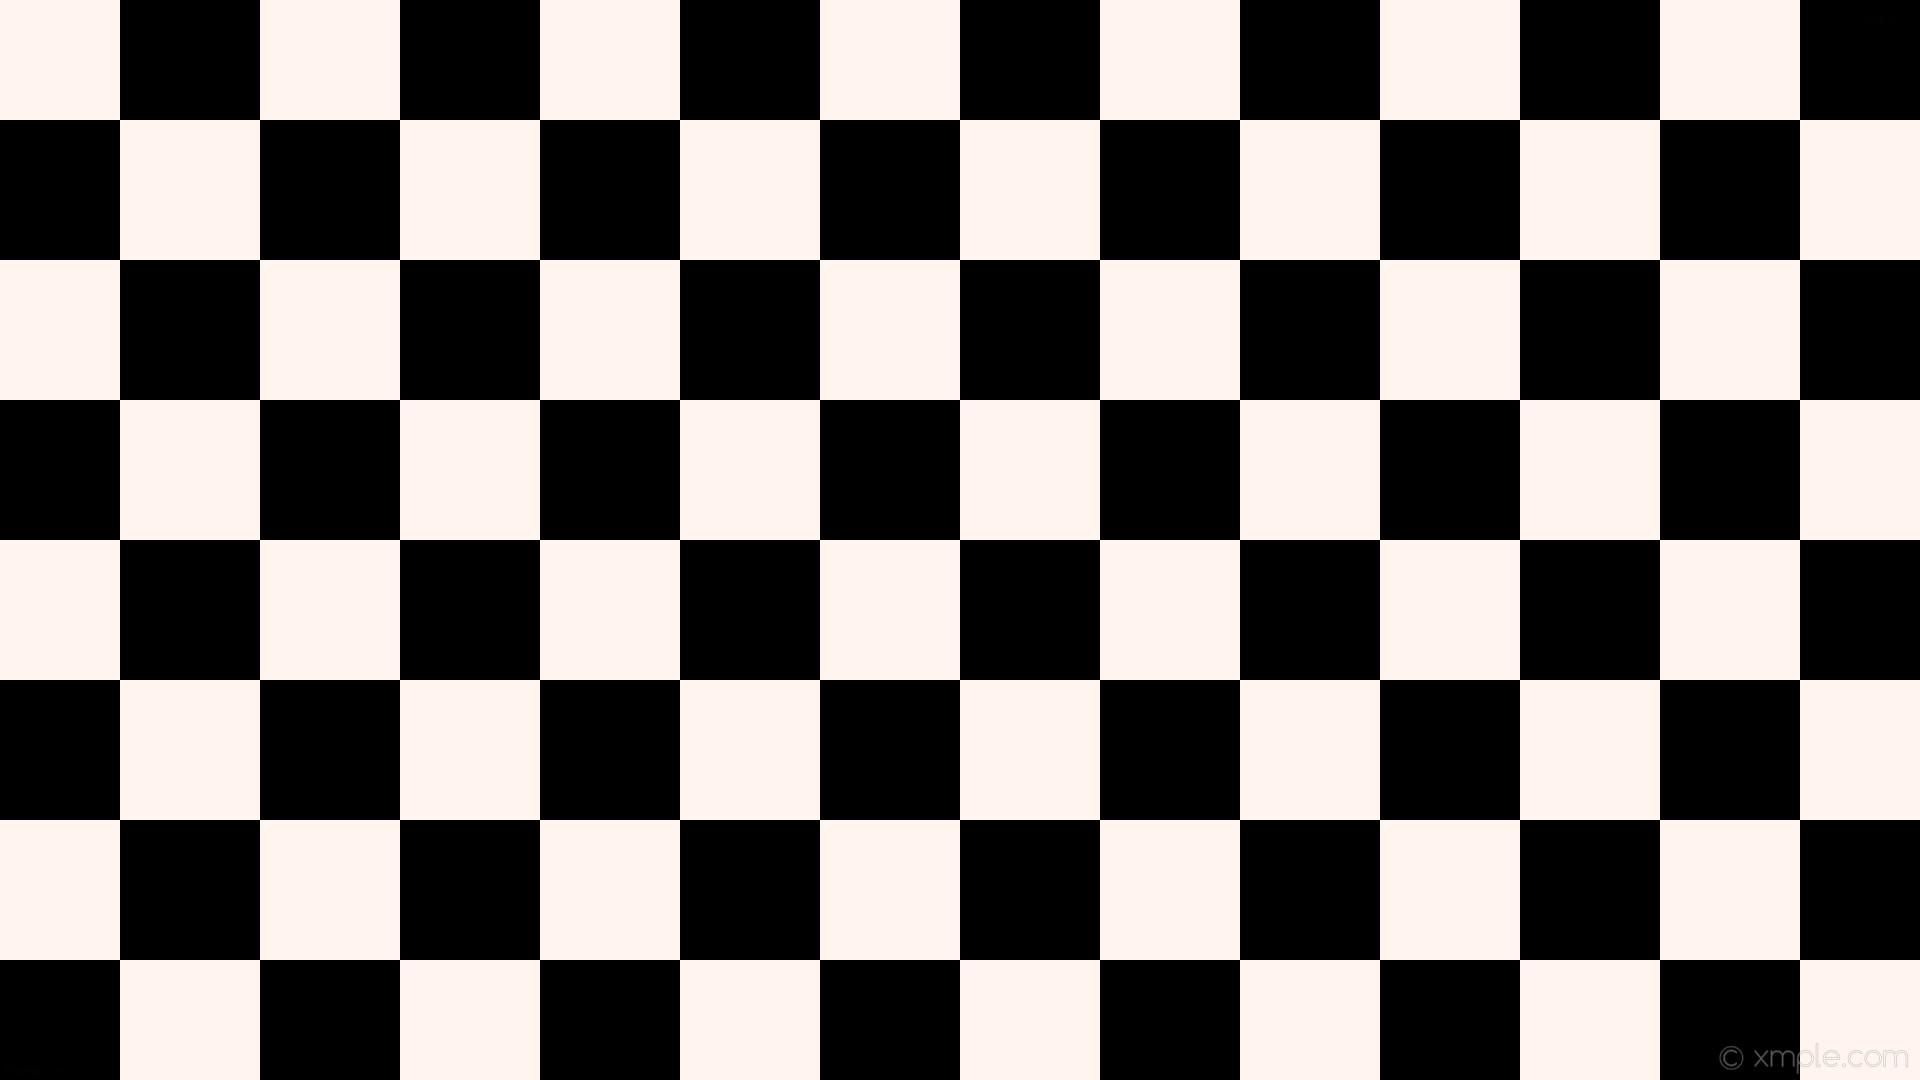 1920x1080 Wallpaper Black White Checkered Squares Seashell 000000 Fff5ee Diagonal 0a 140px